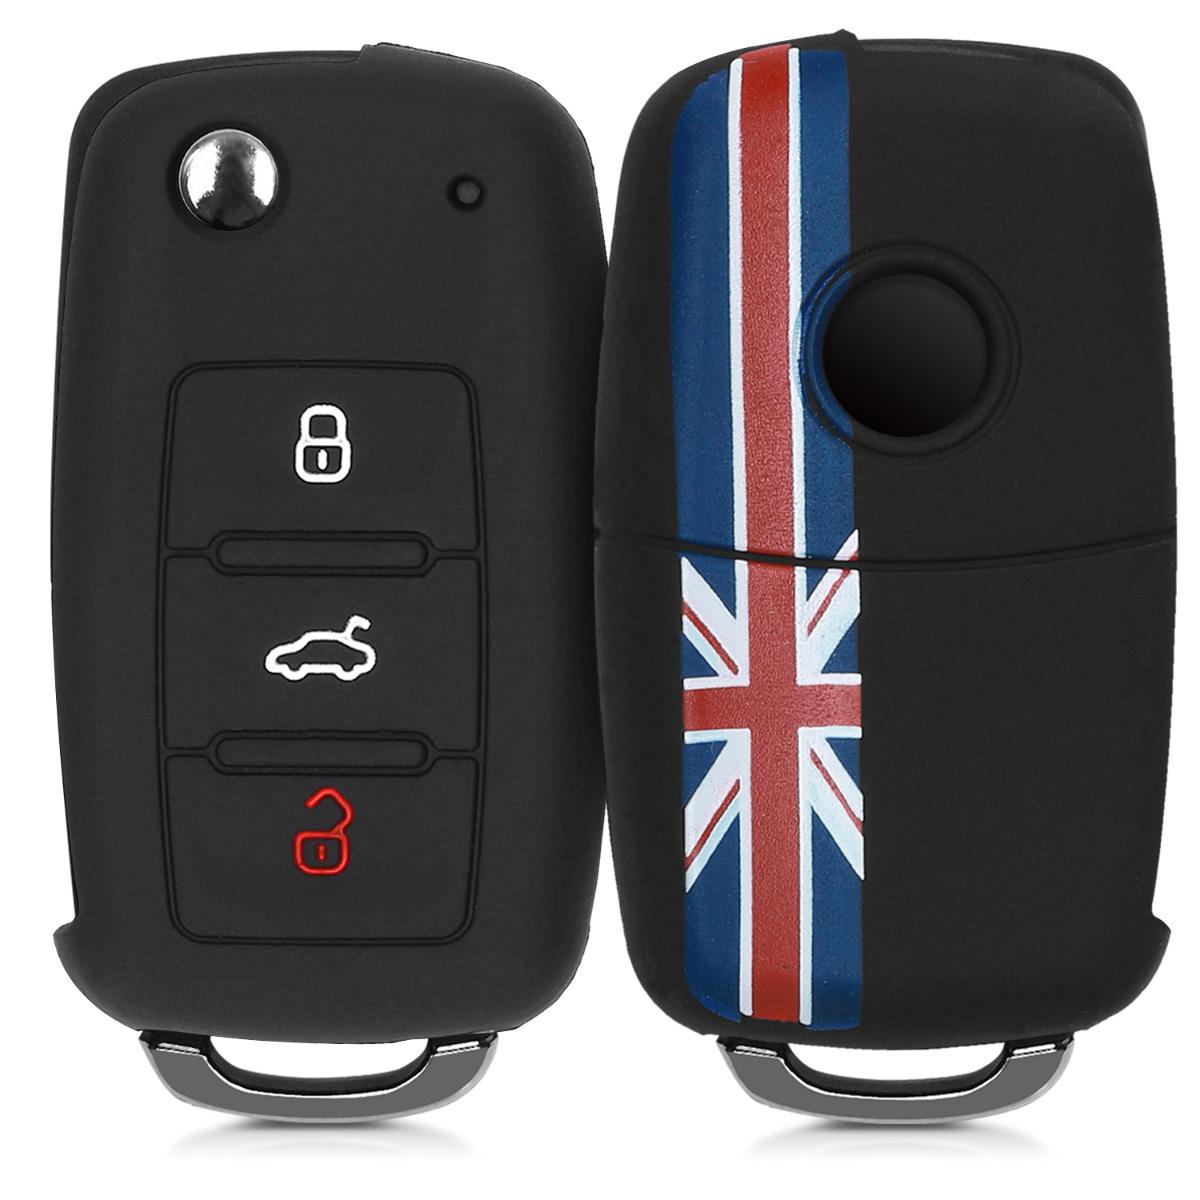 KW Θήκη Κλειδιού VW Skoda Seat - Σιλικόνη - 3 Κουμπιά - Red / Blue / Black (41729.57)